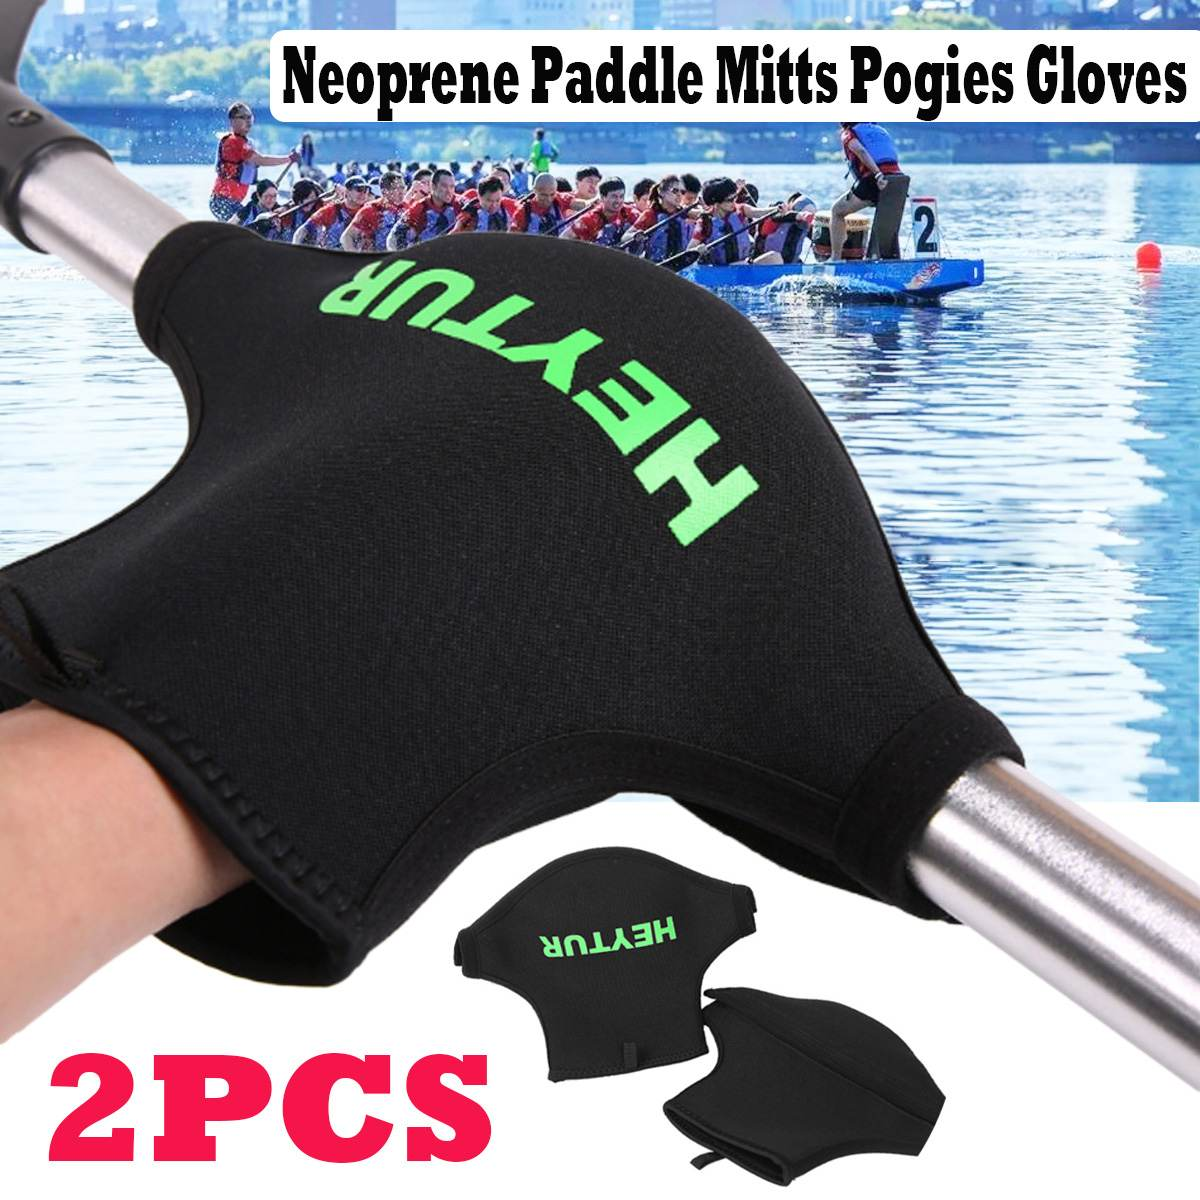 Neoprene Water Sports Kayaking Canoeing Paddle Paddling Oar Gloves Mitts Pogies